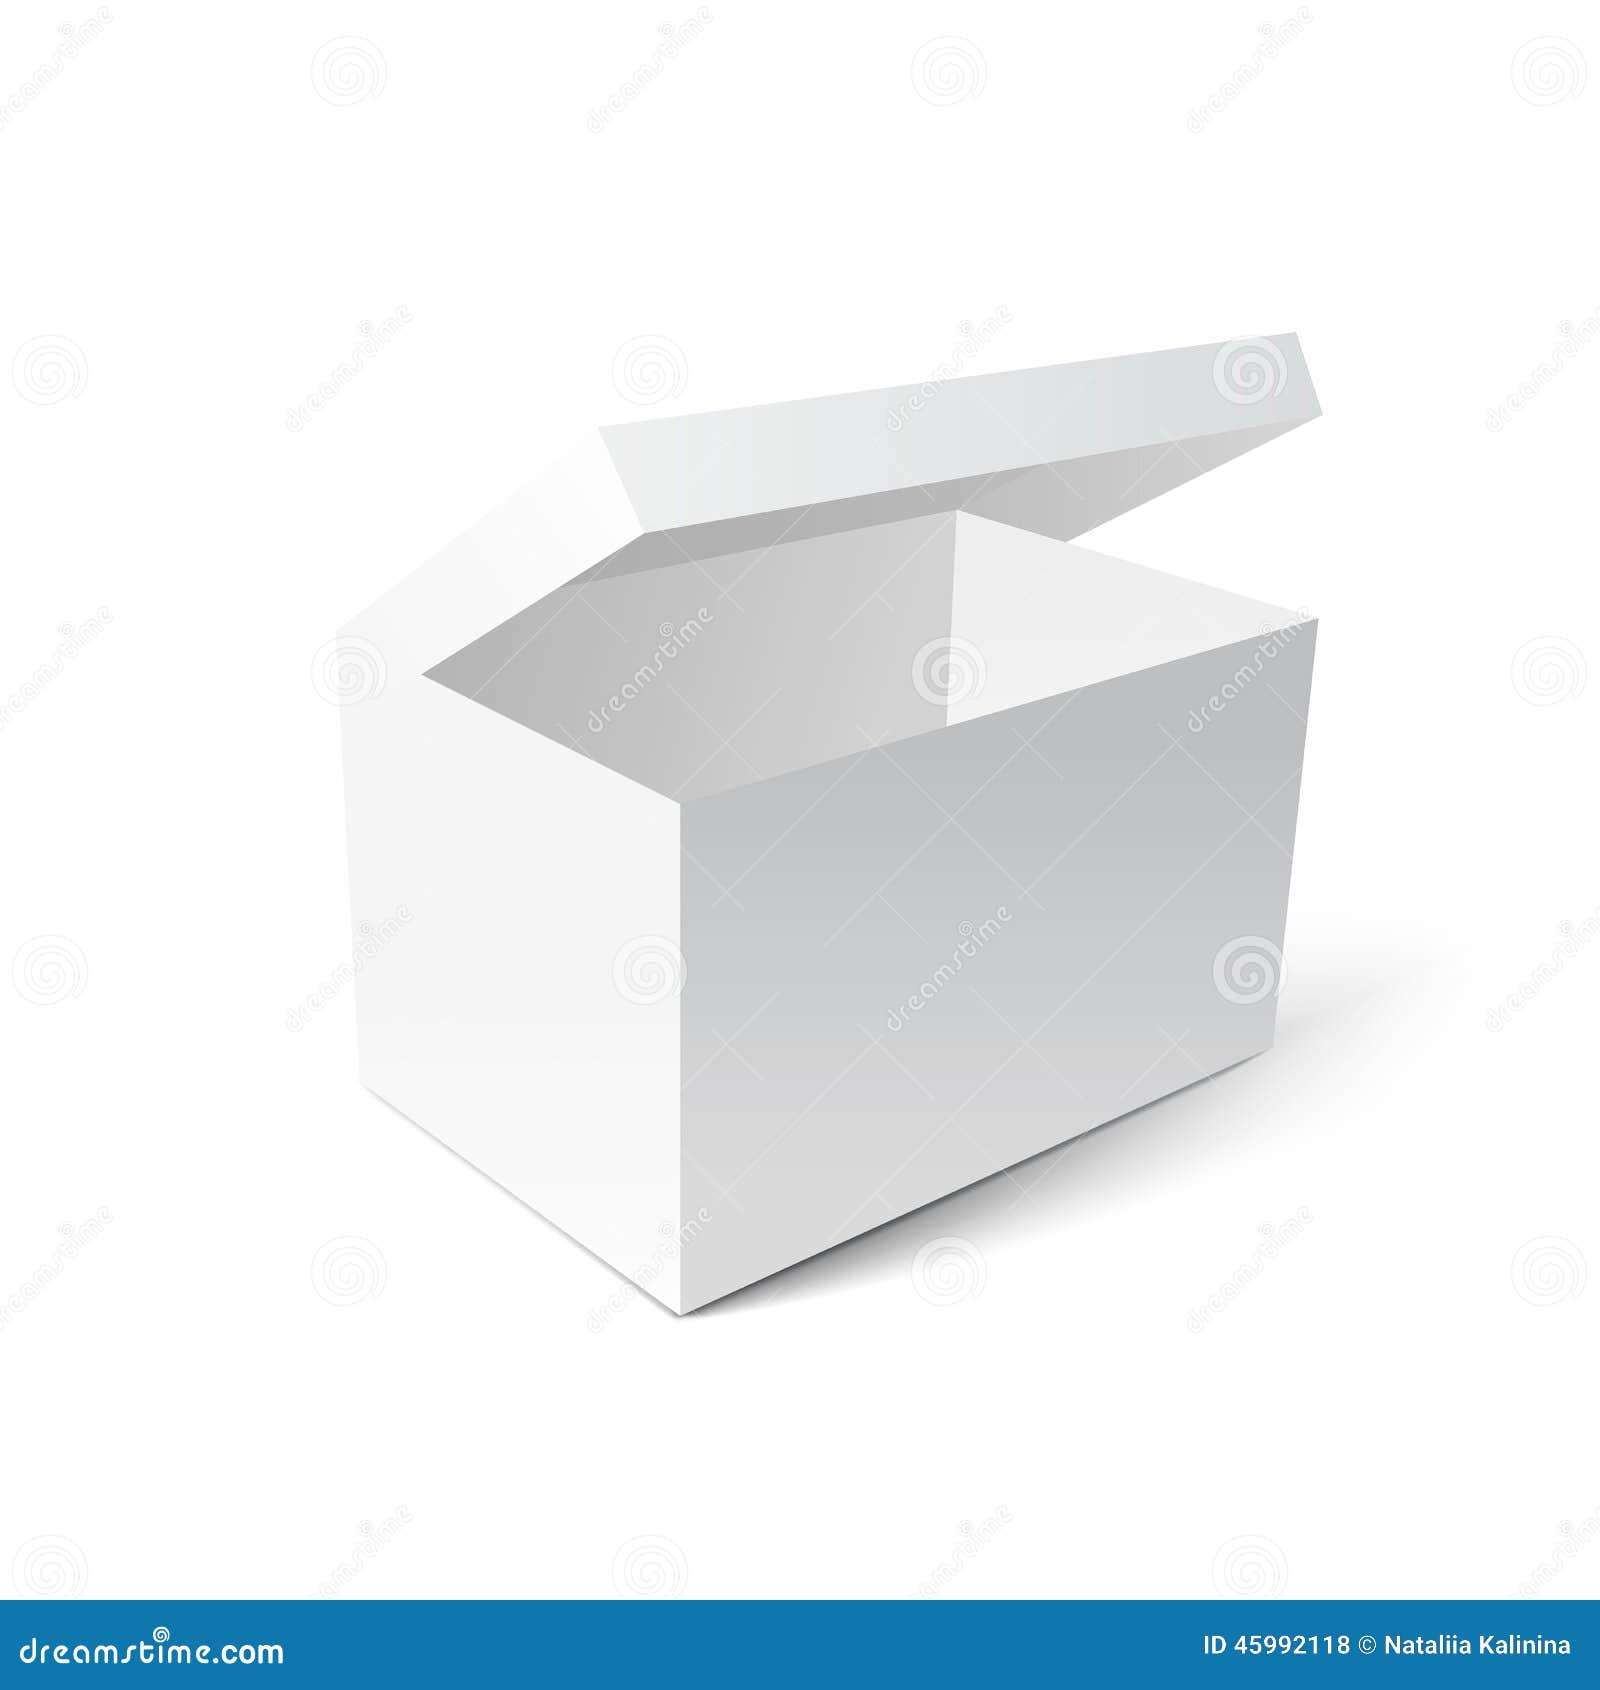 bo te blanche de carton de cadeau illustration de vecteur image 45992118. Black Bedroom Furniture Sets. Home Design Ideas